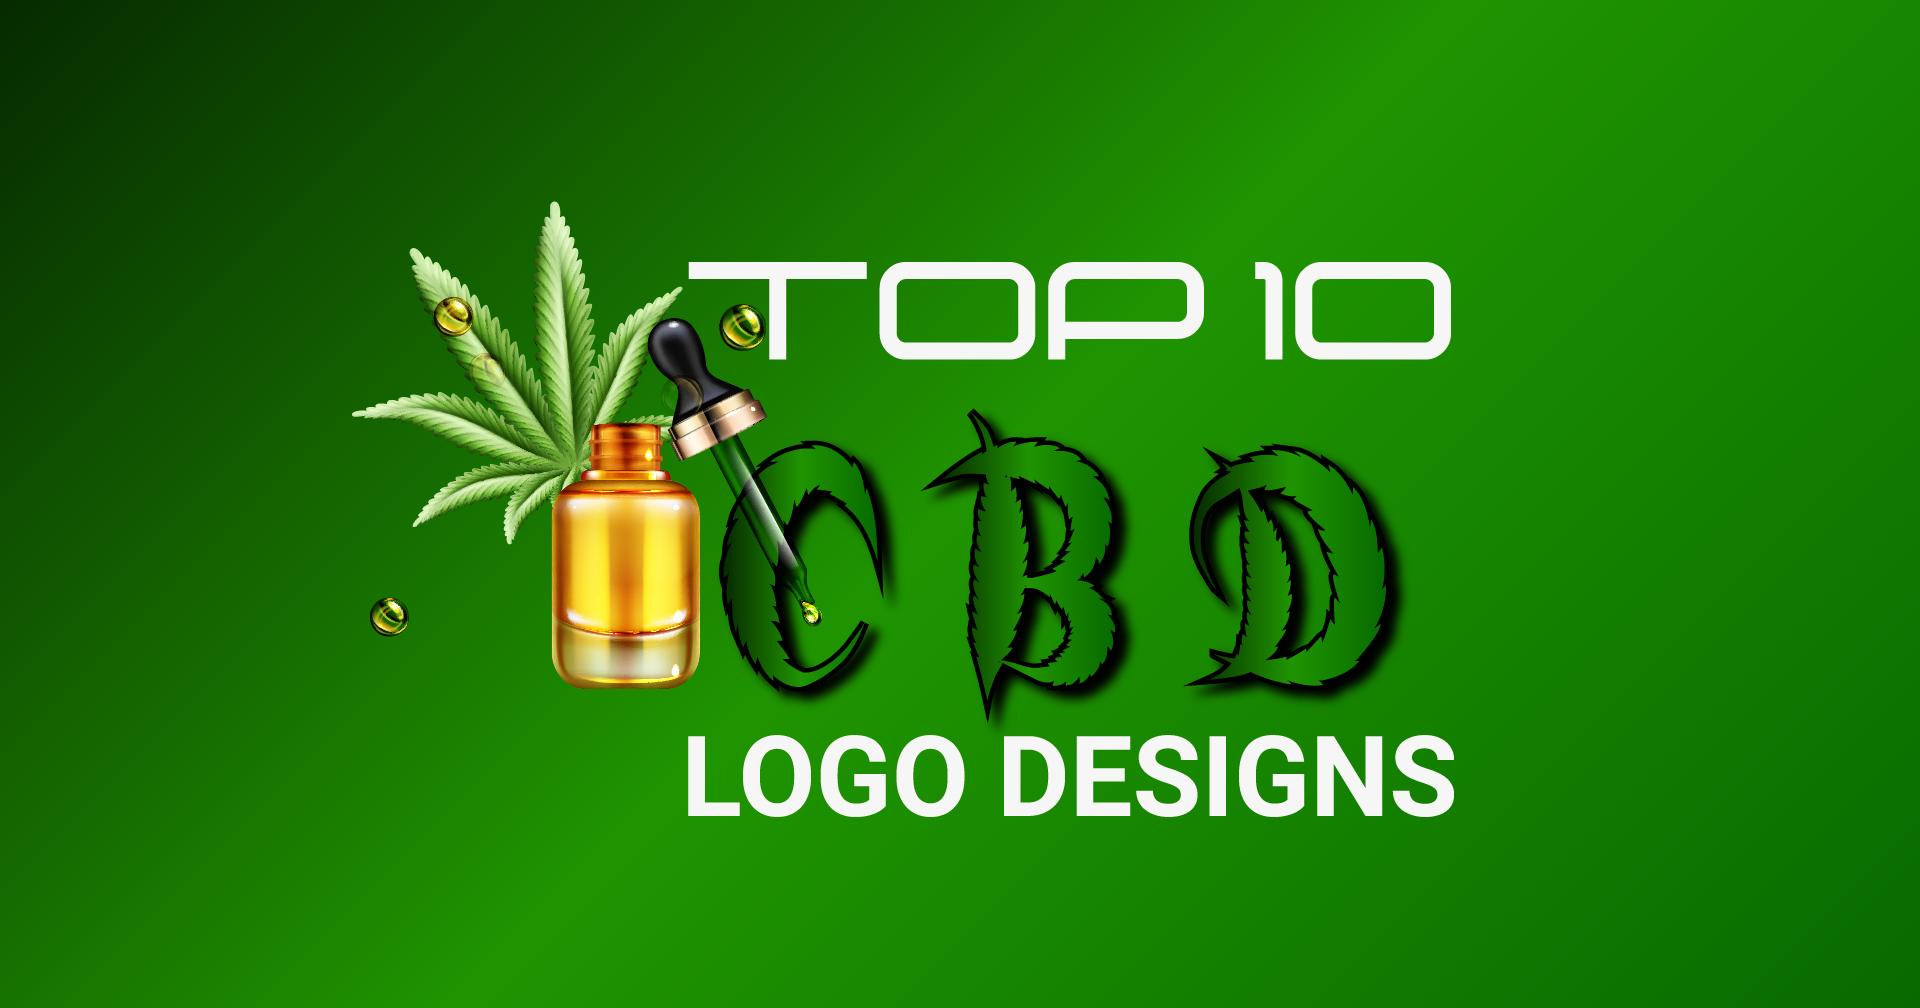 The Top 10 CBD Logo Designs